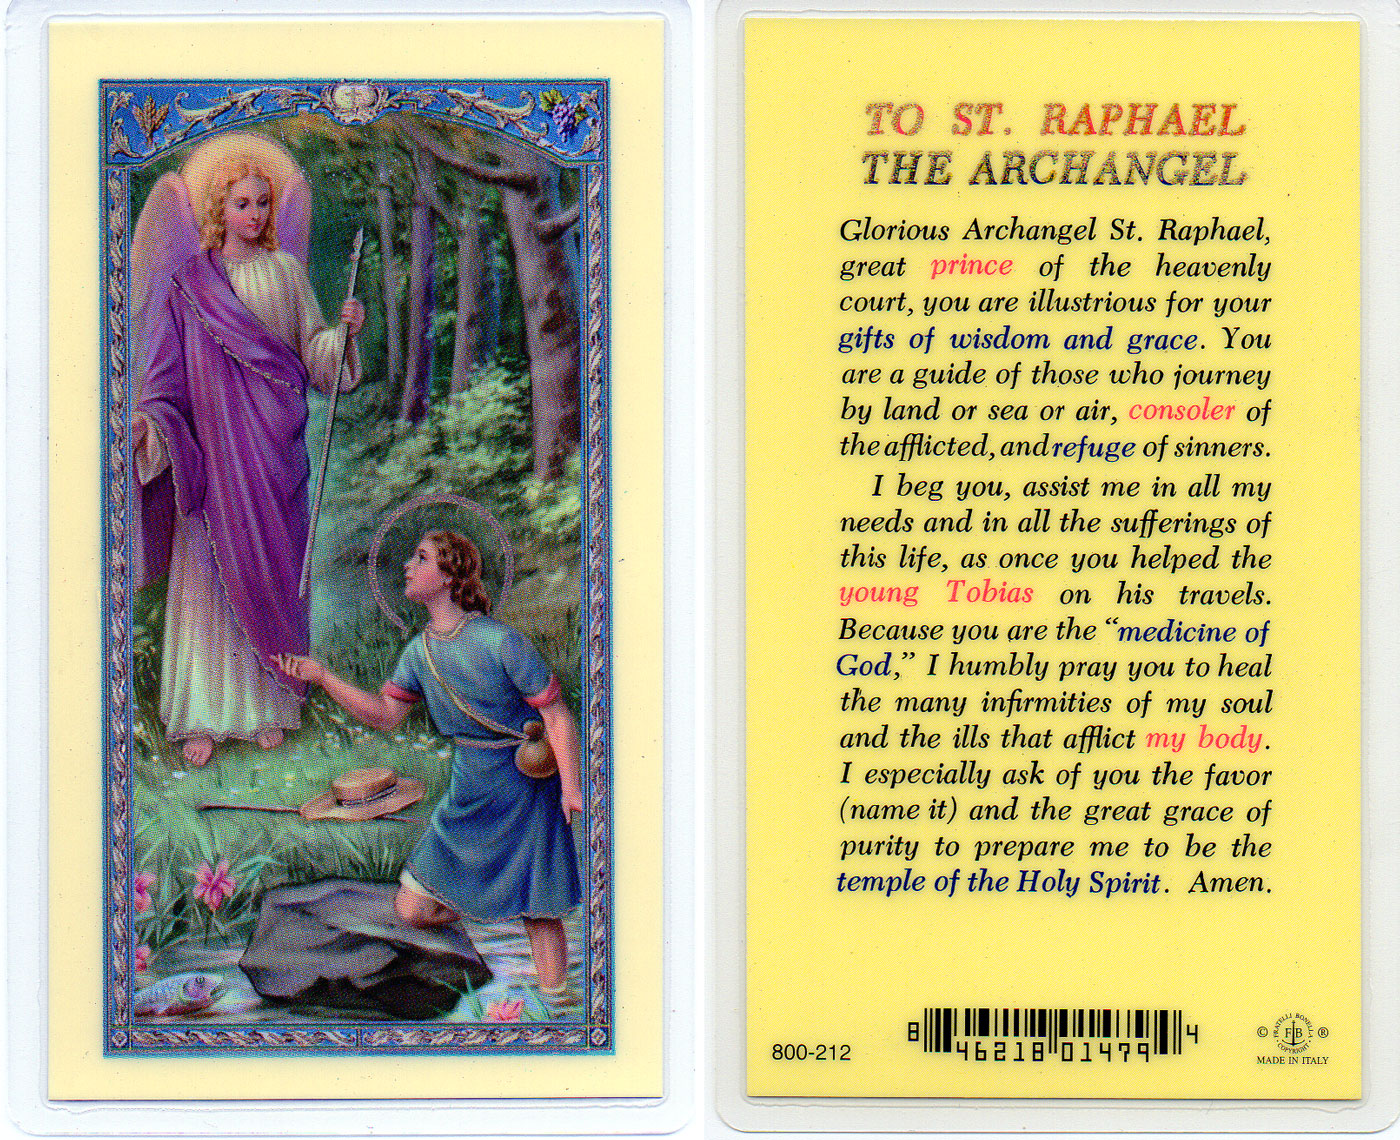 raphael_card.jpg